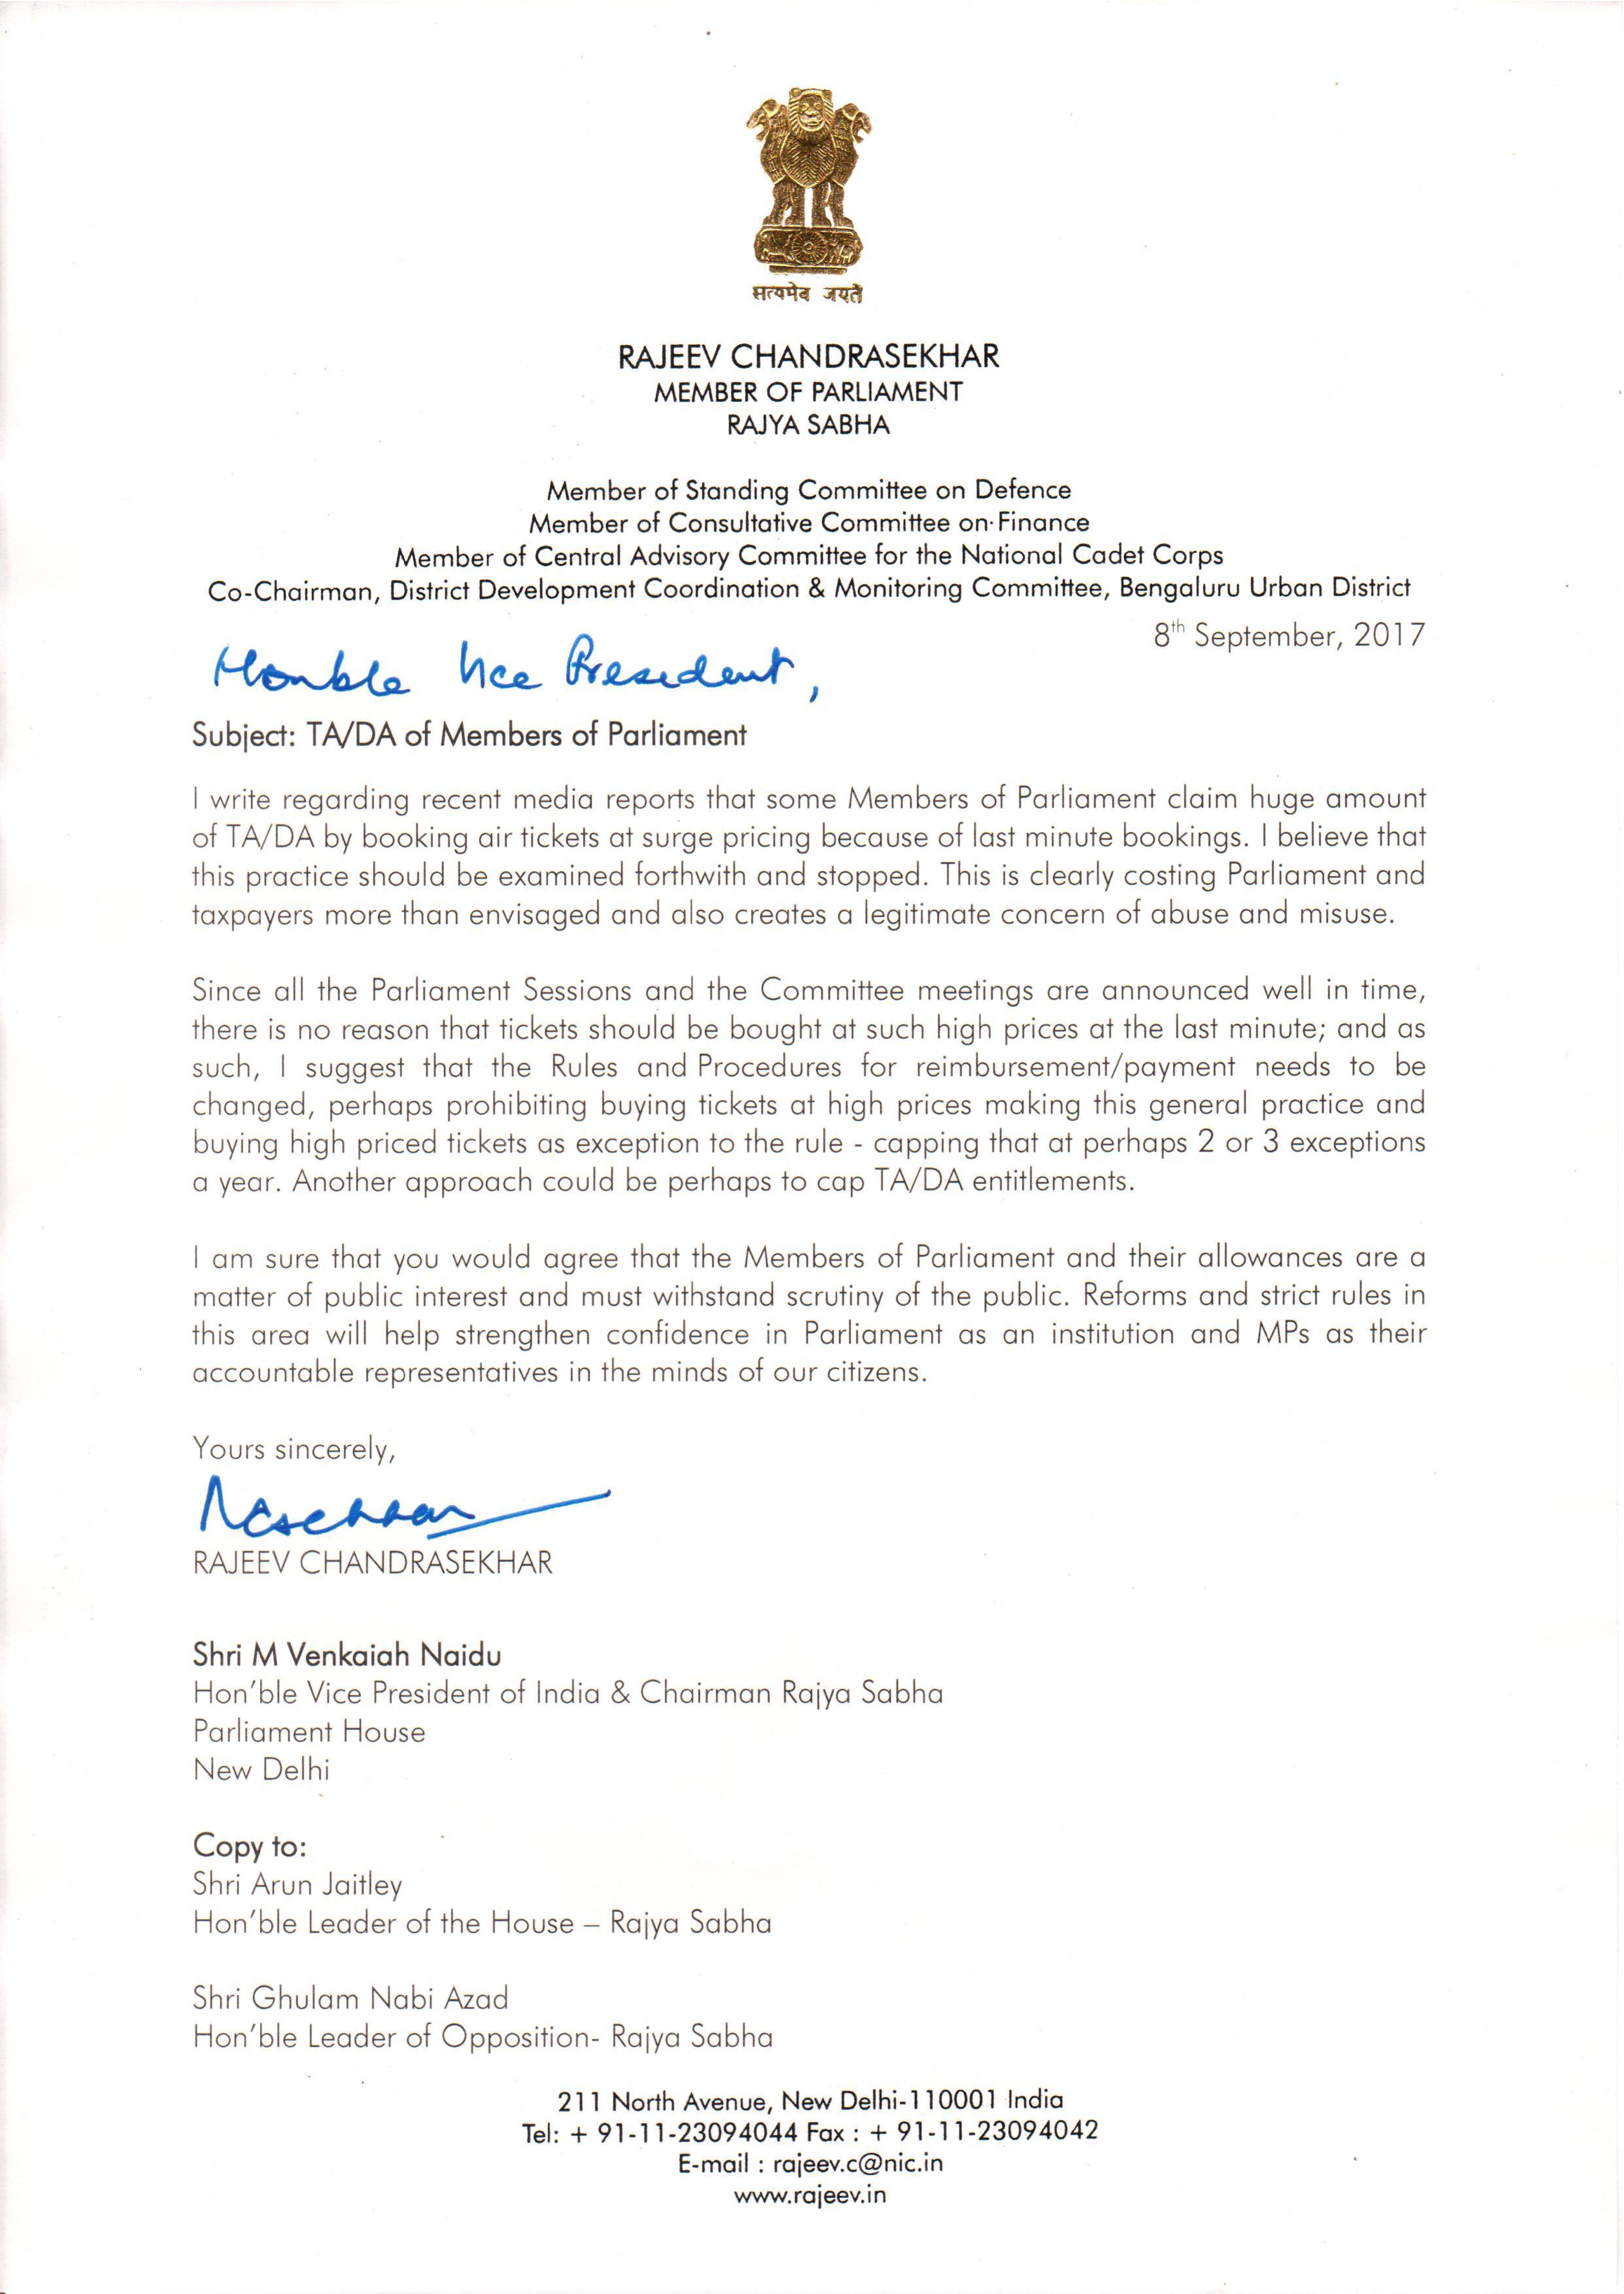 Transform india economy governance rajeev chandrasekhar rajeev writes to vice president of india regarding tada members of parliament read letter expocarfo Choice Image